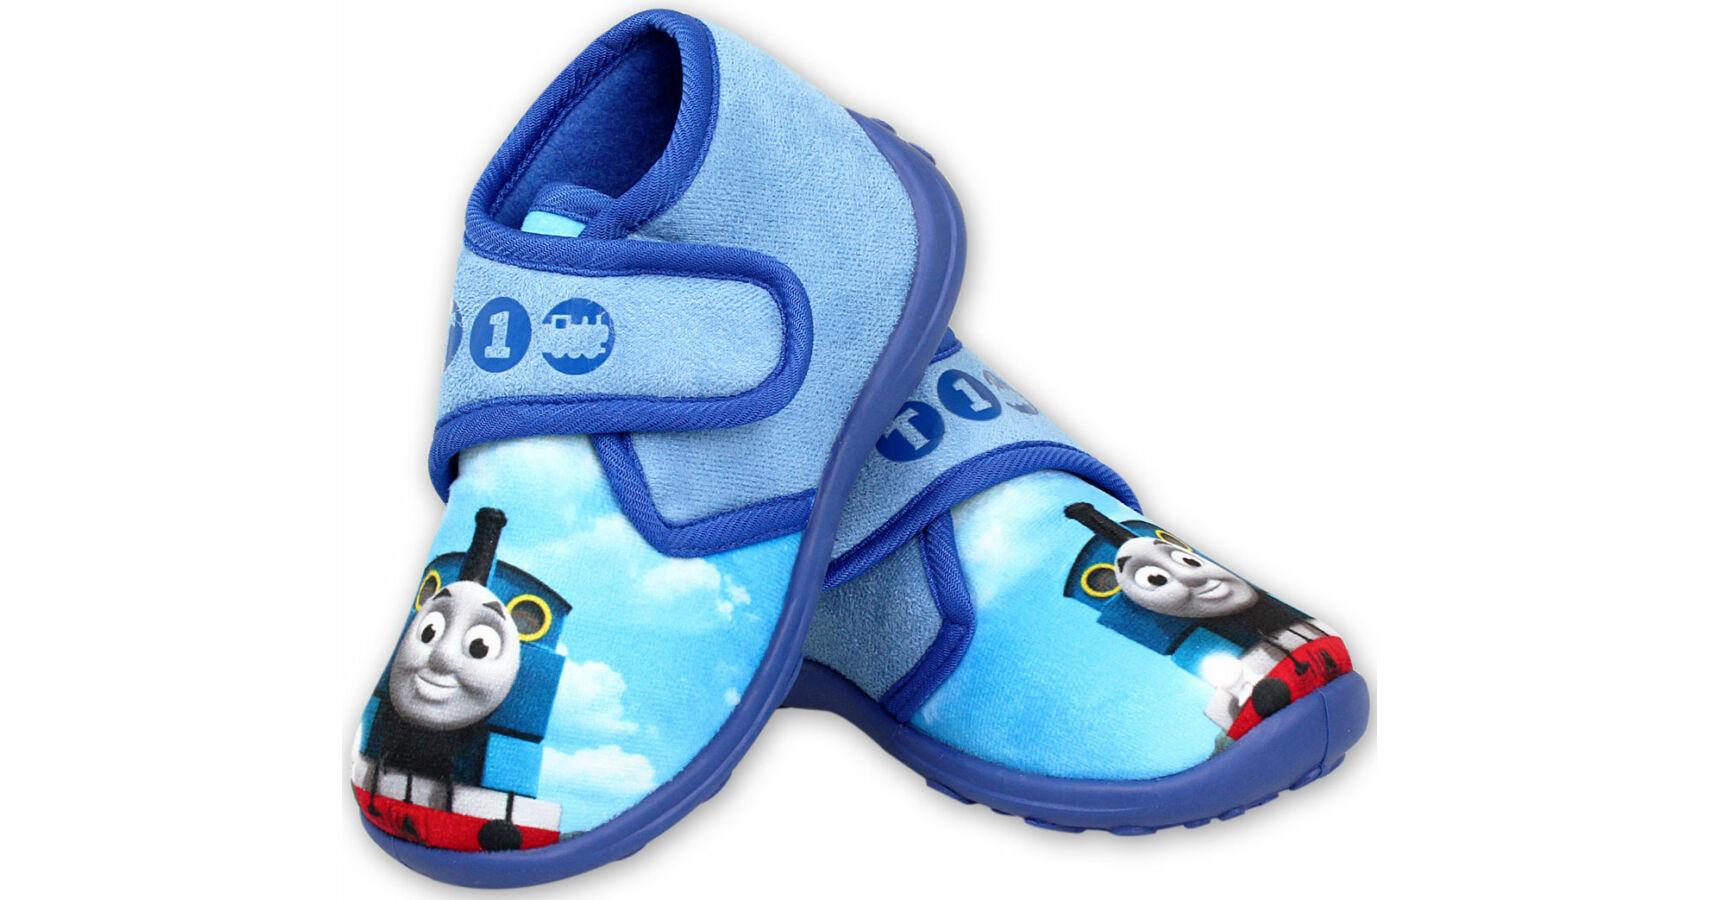 Gyerek benti cipő, Thomas